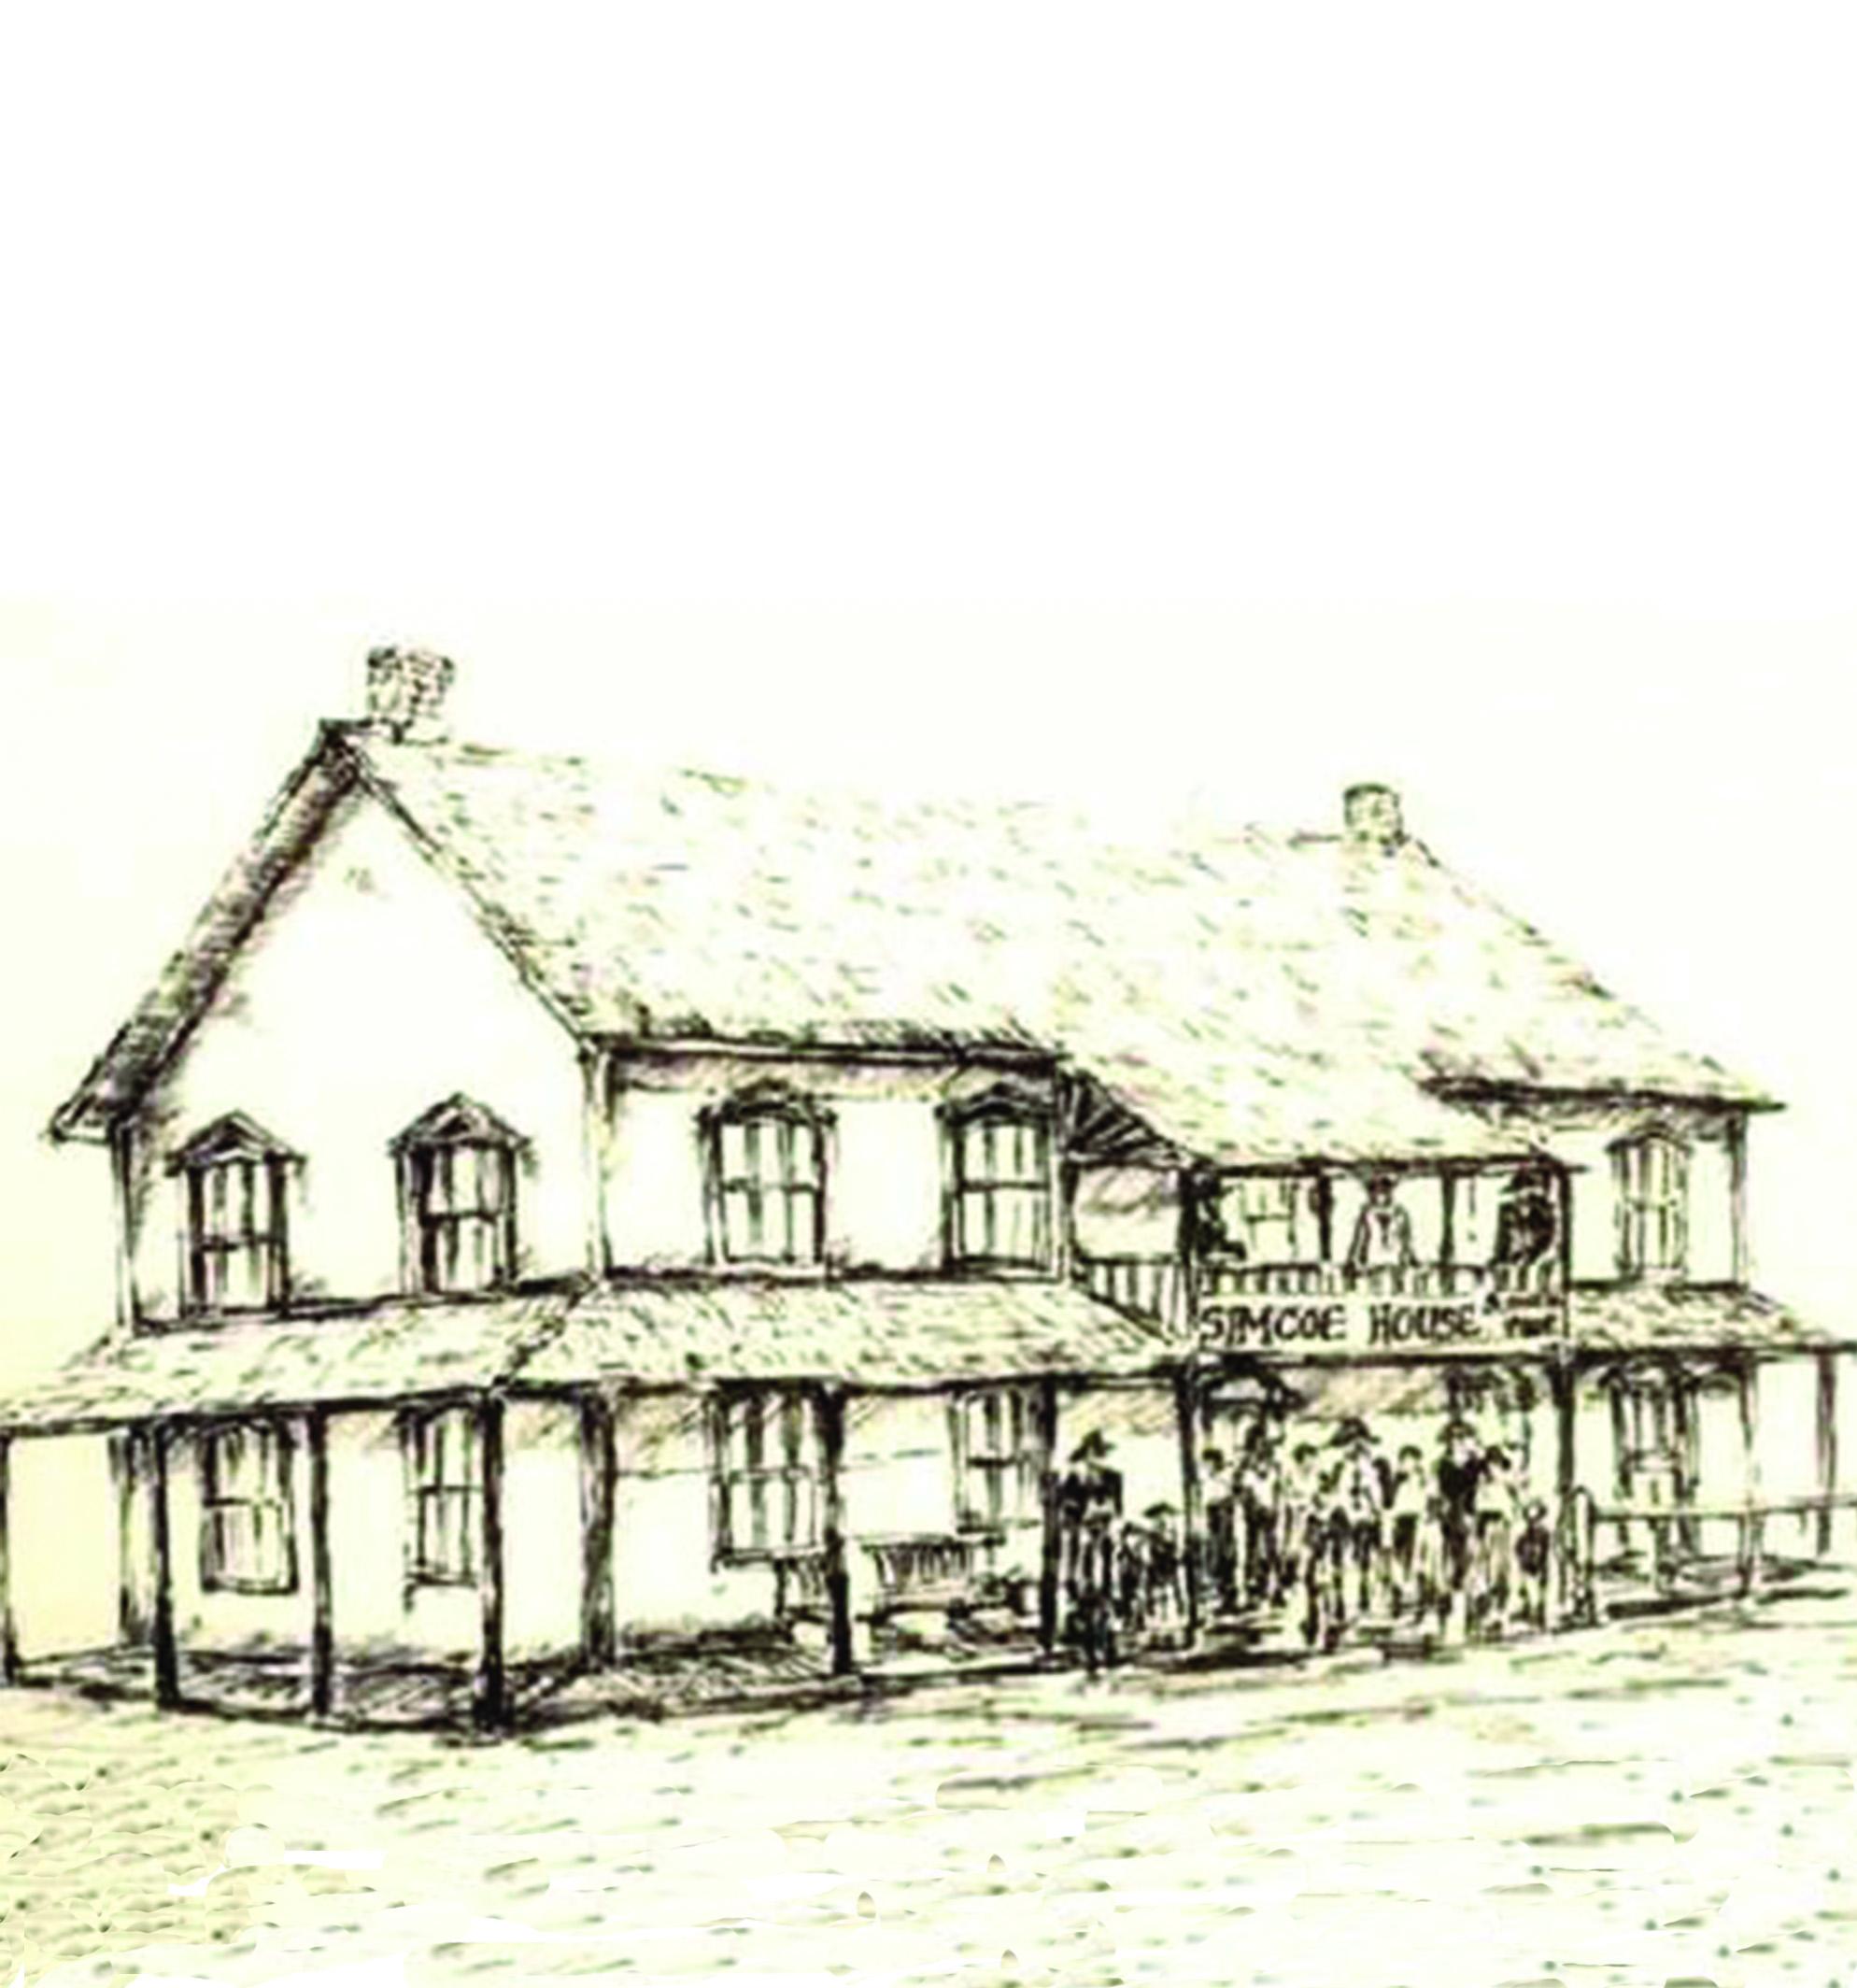 Simcoe House Hotel.jpg